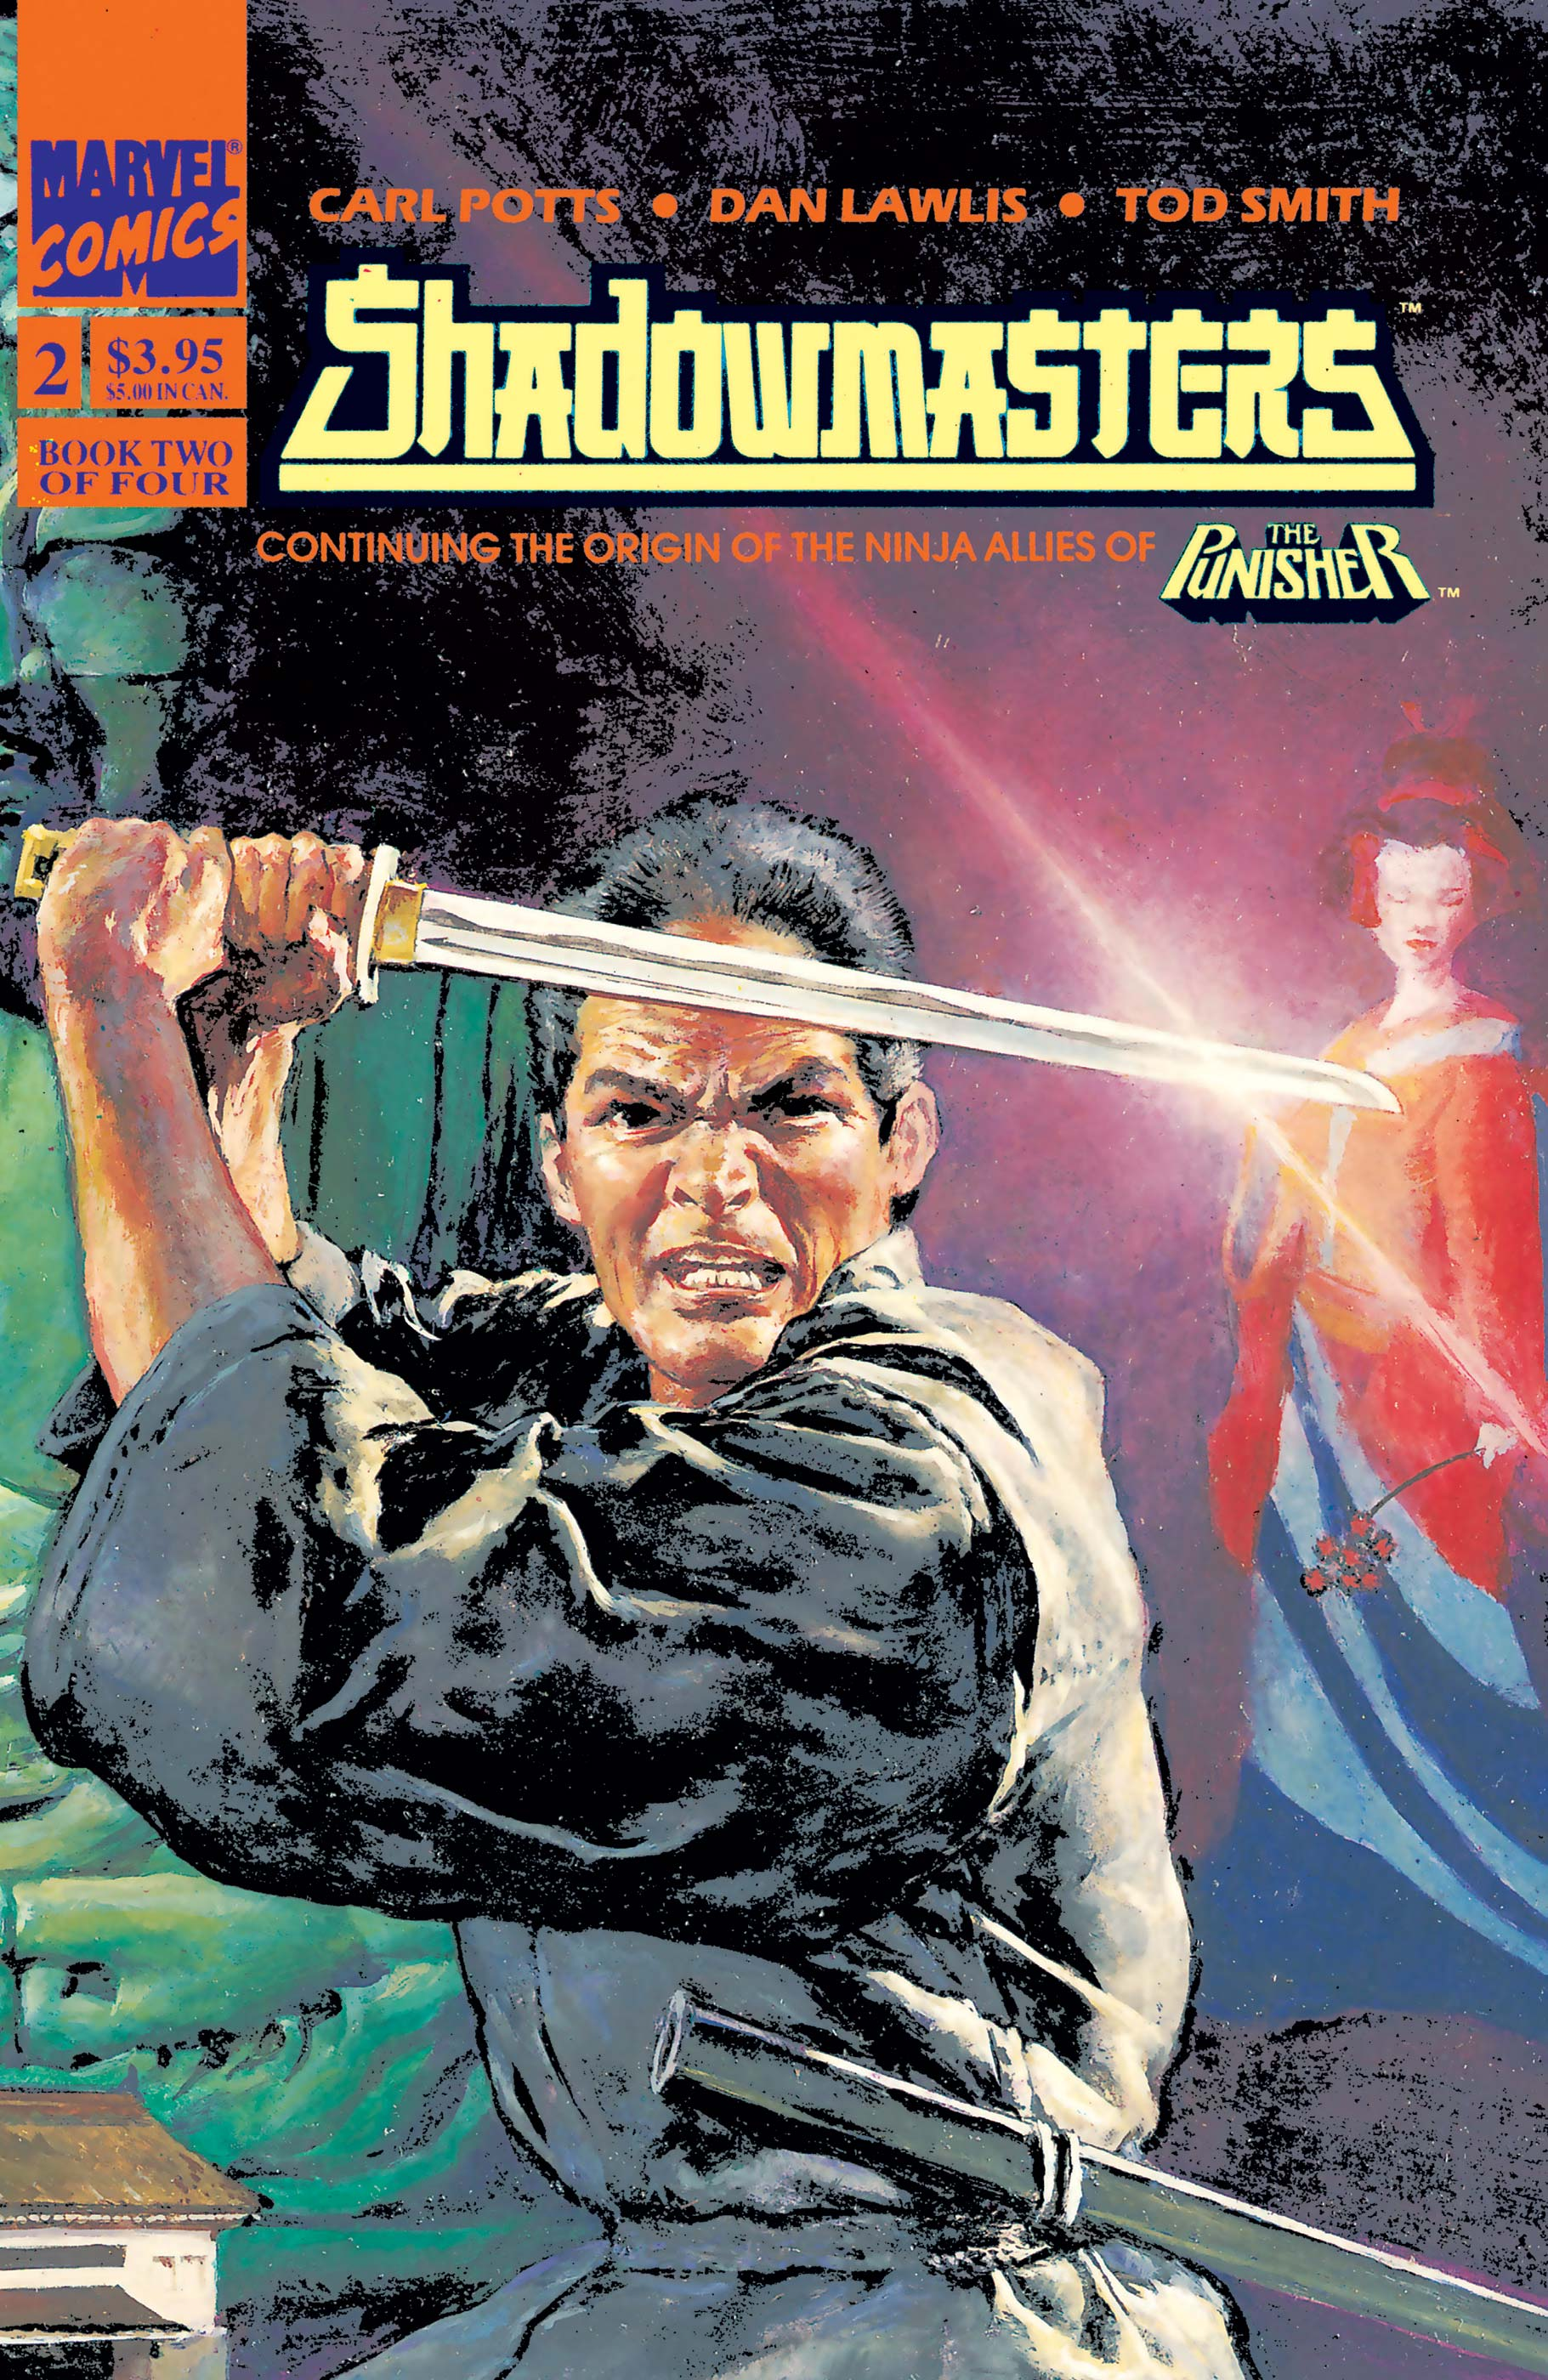 Shadowmasters (1989) #2